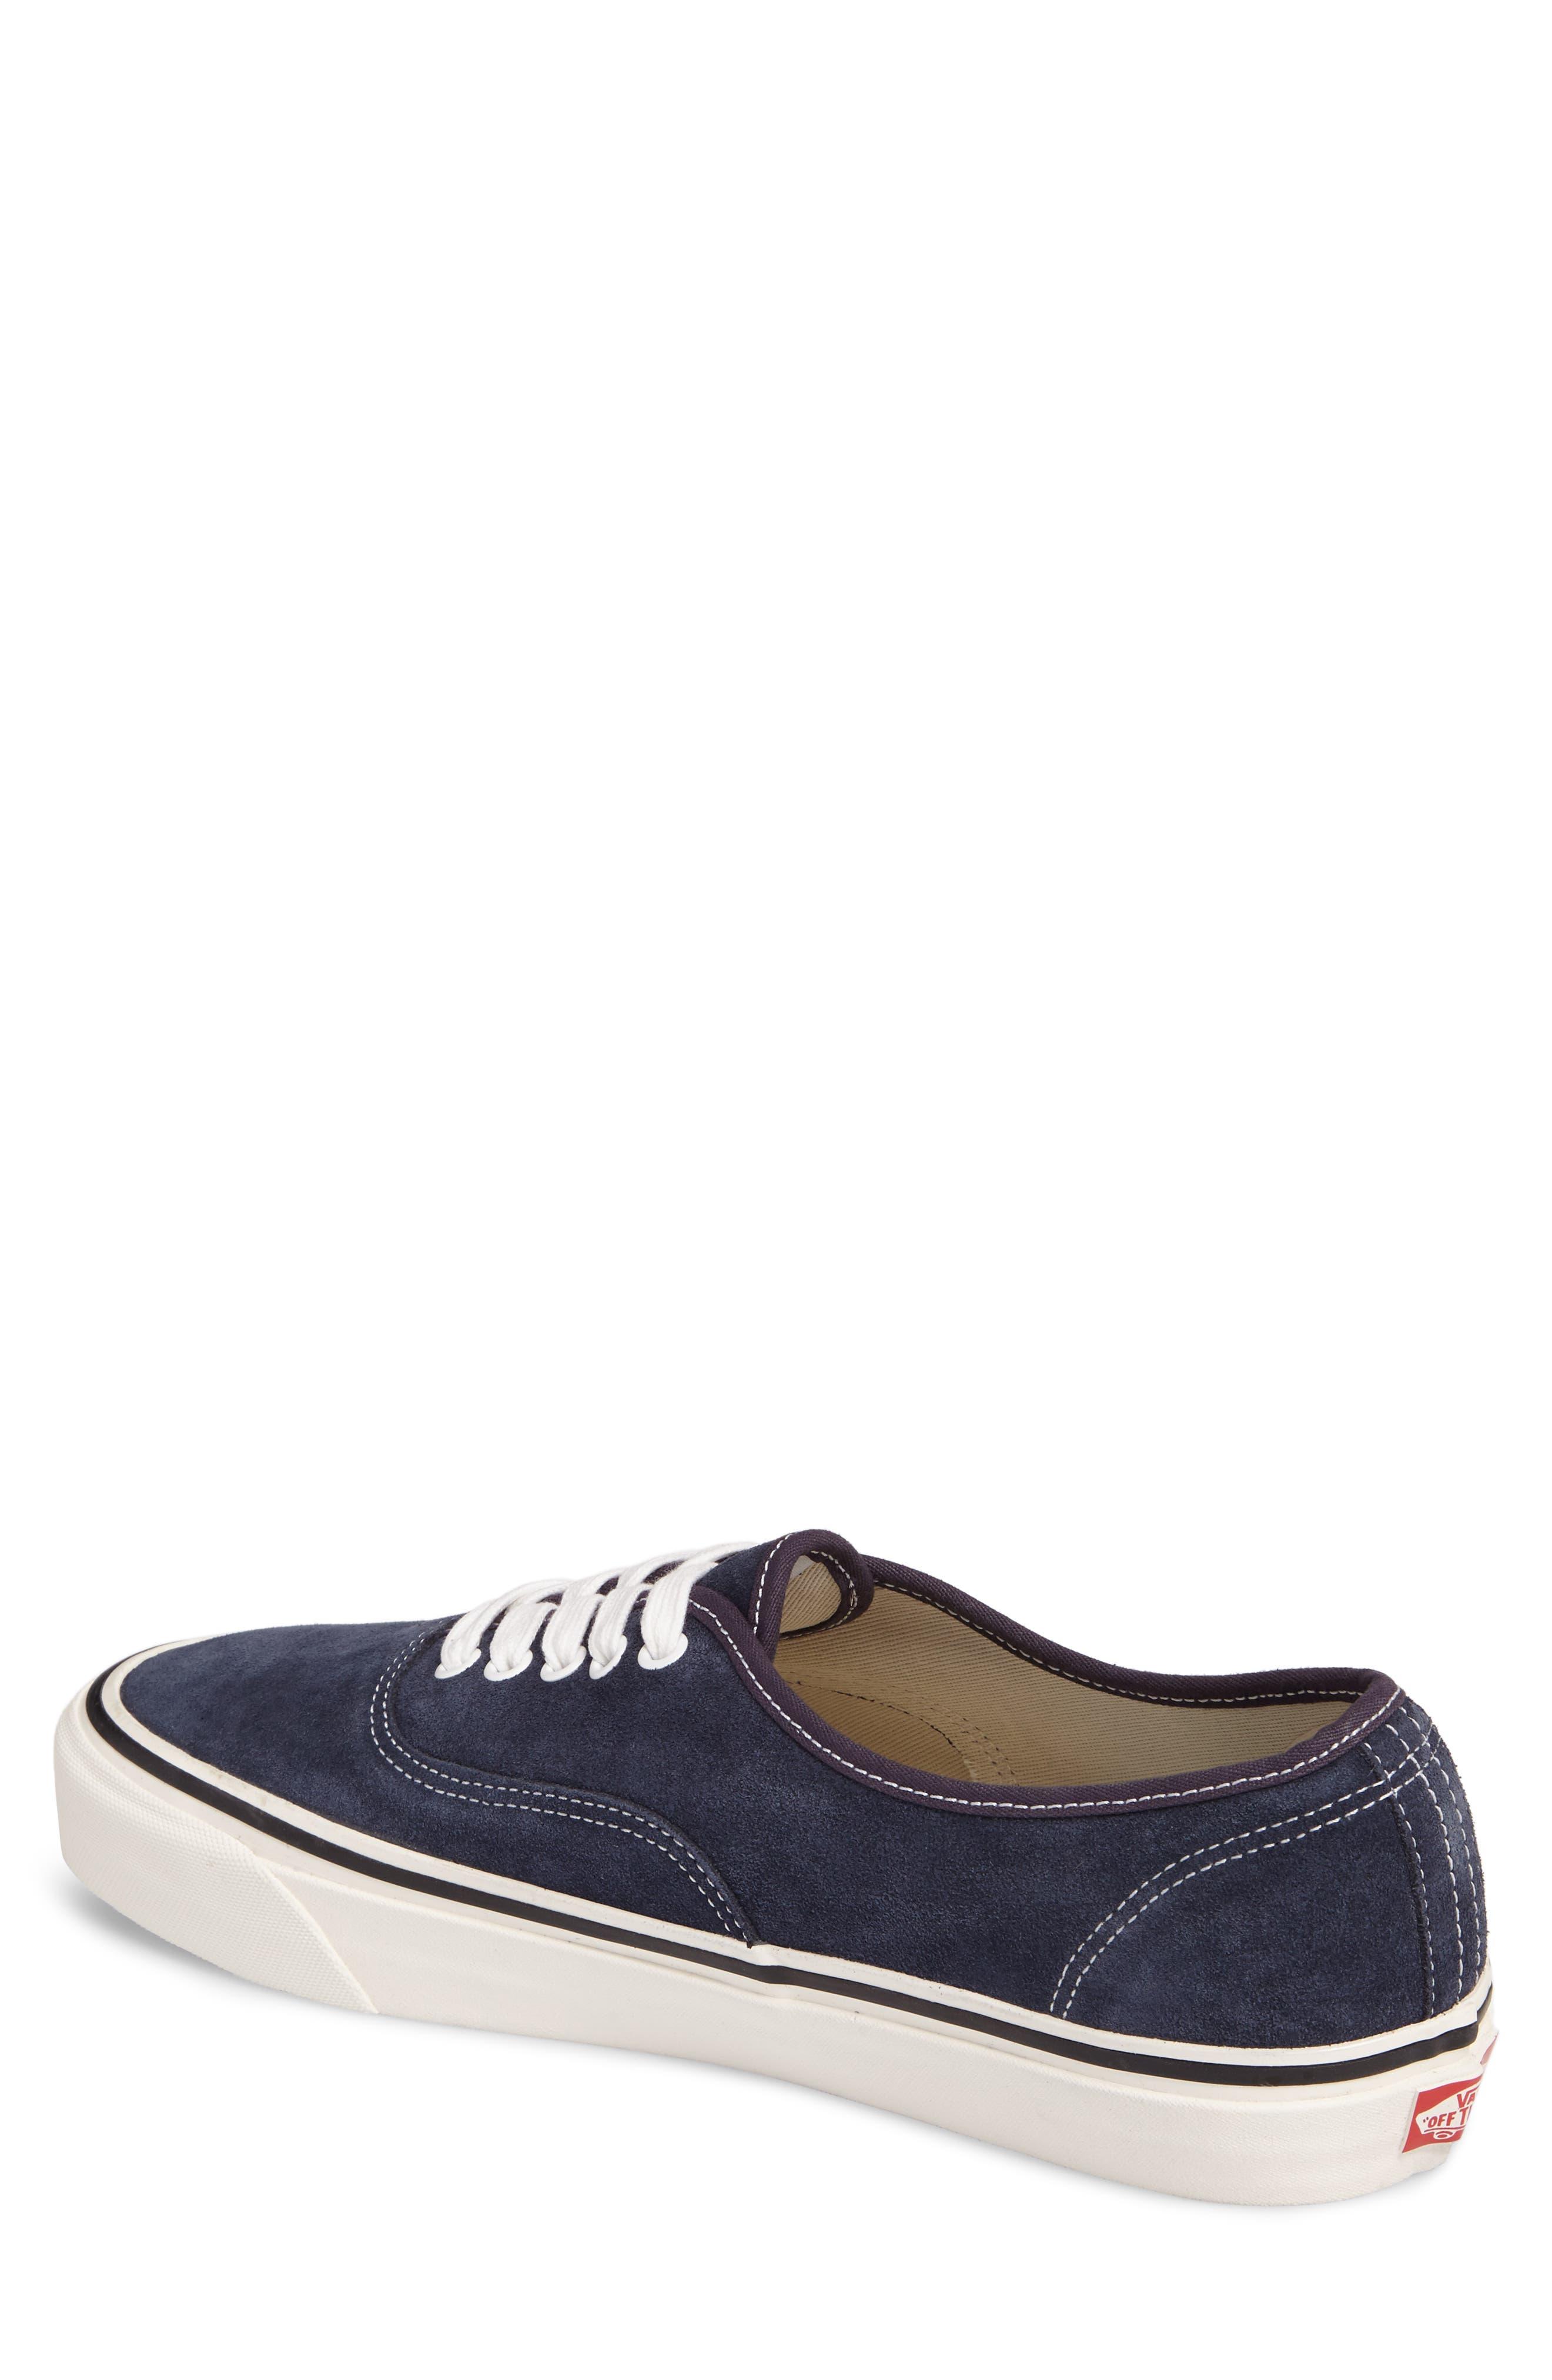 Alternate Image 2  - Vans UA Authentic 44 DX Sneaker (Men)